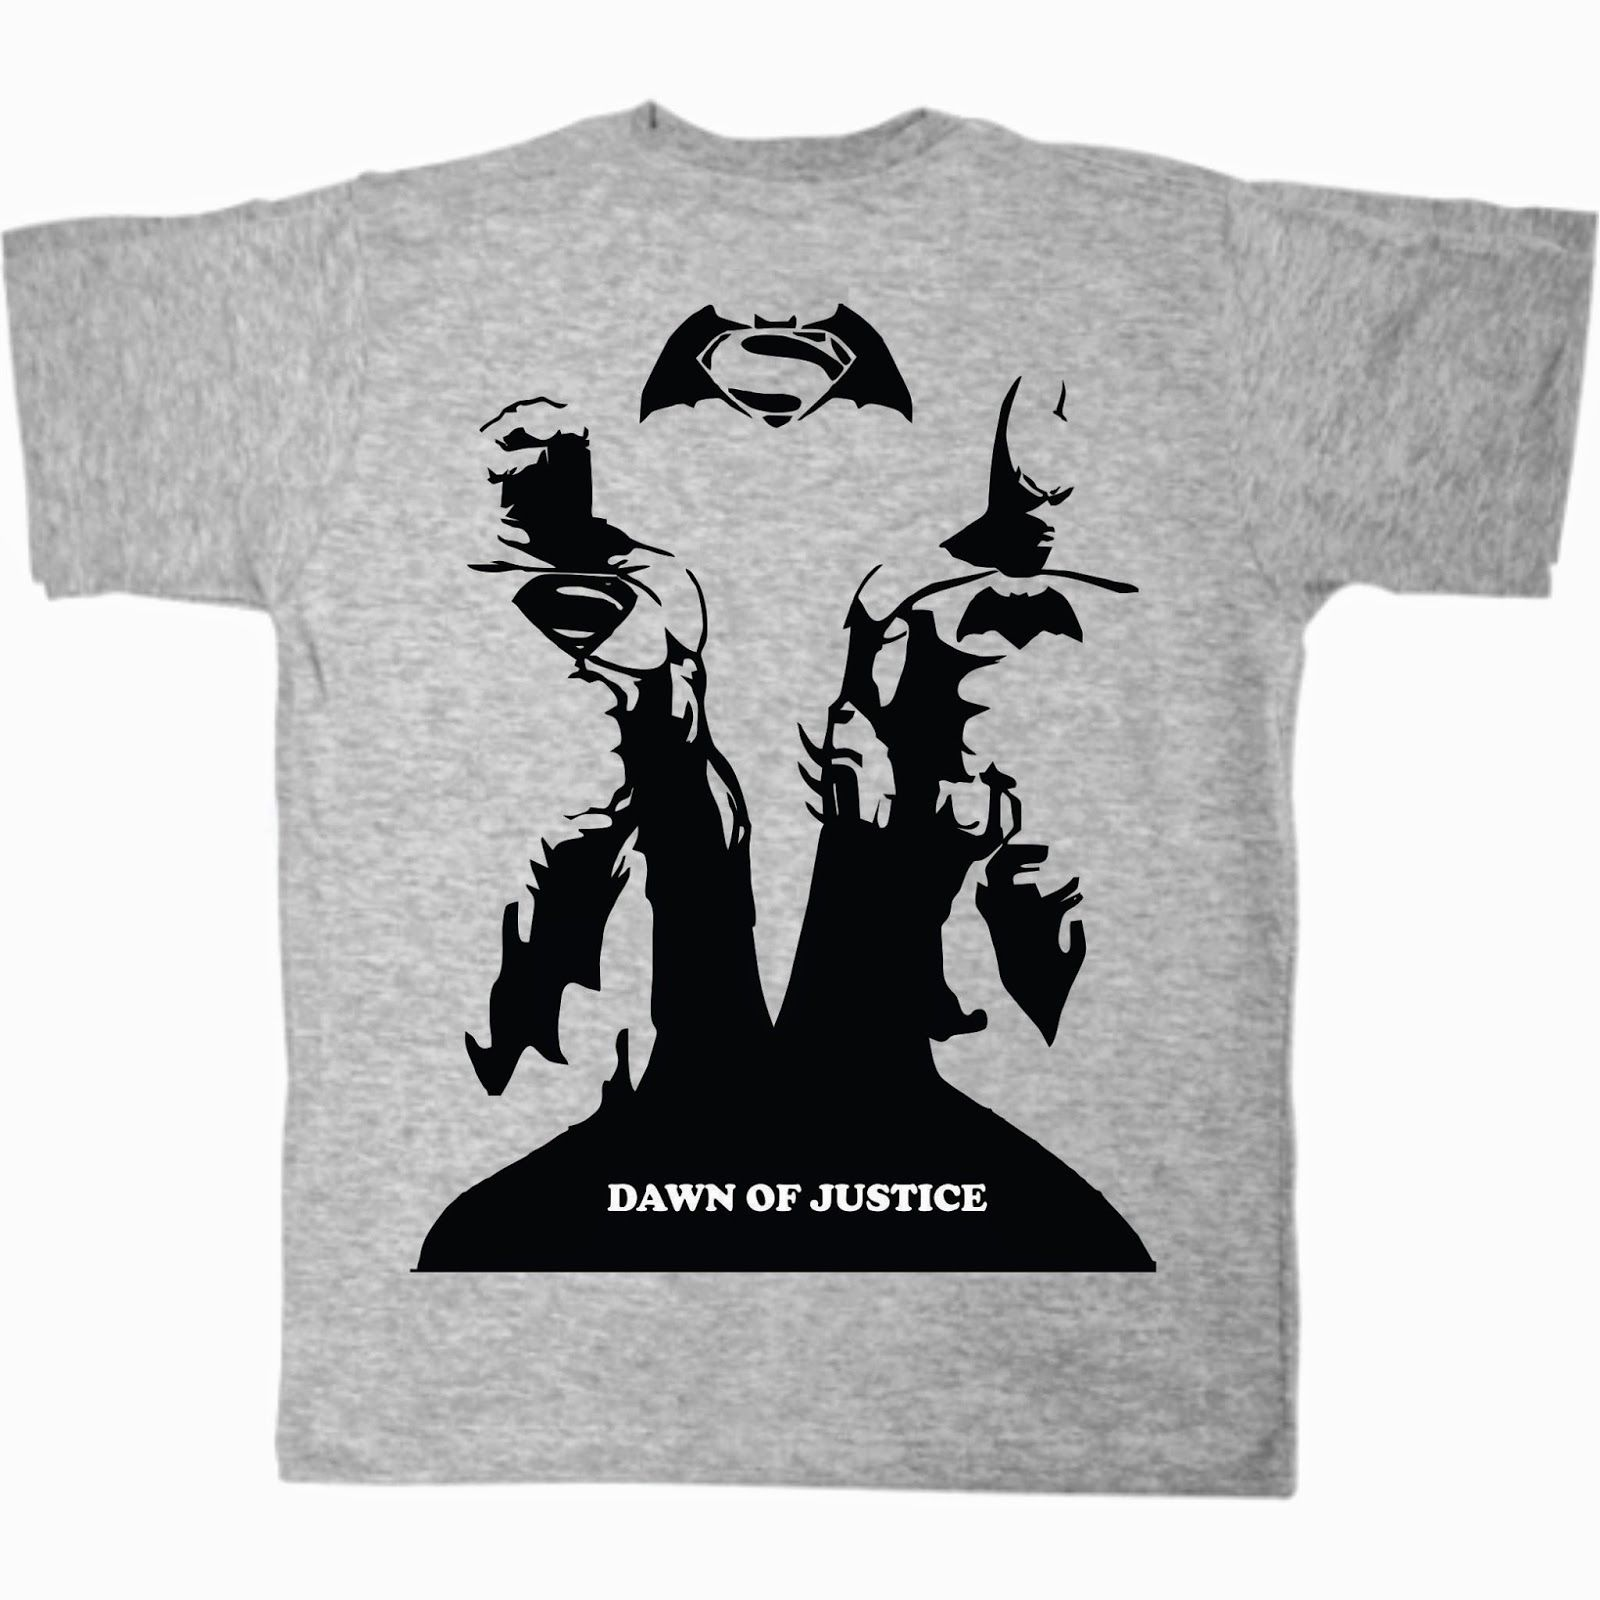 knupSilk - ESTAMPARIA/SERIGRAFIA: Batman vs Superman - Dawn of Justice